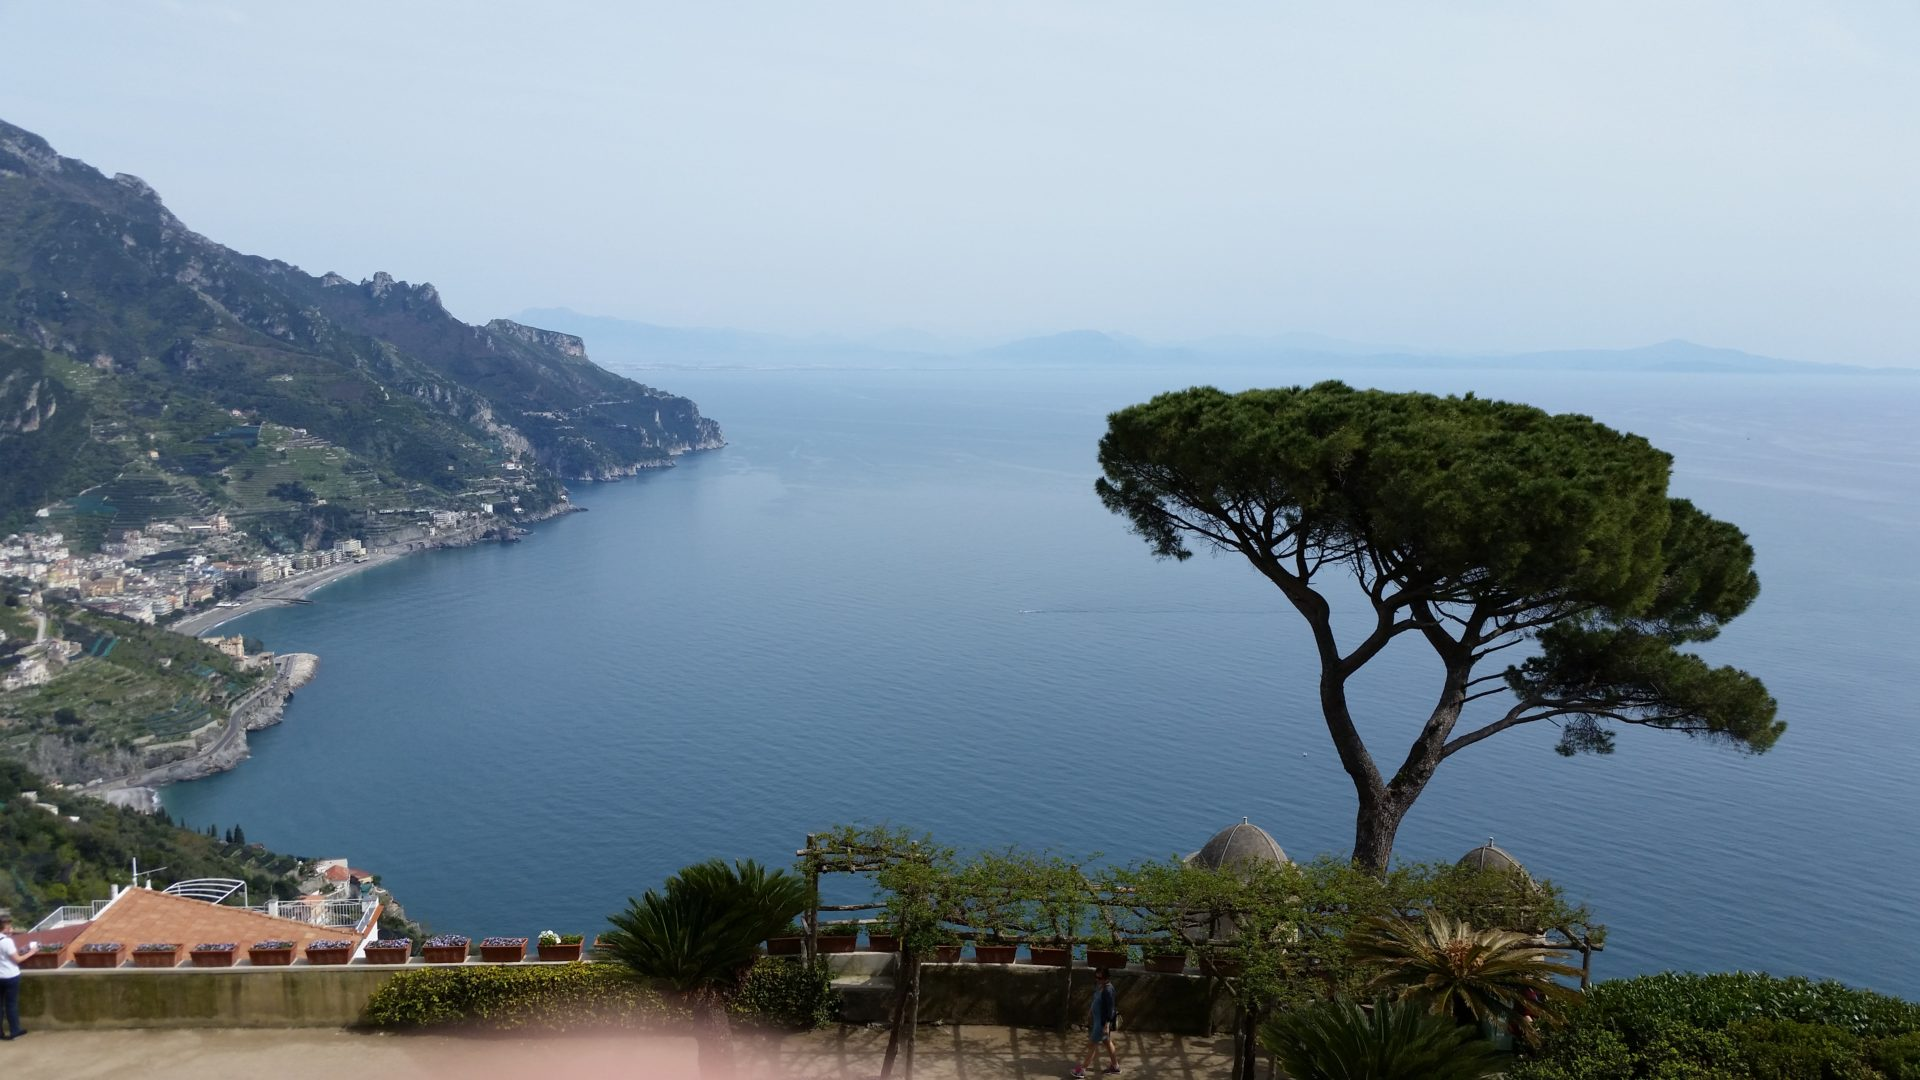 Amalfi with Tree